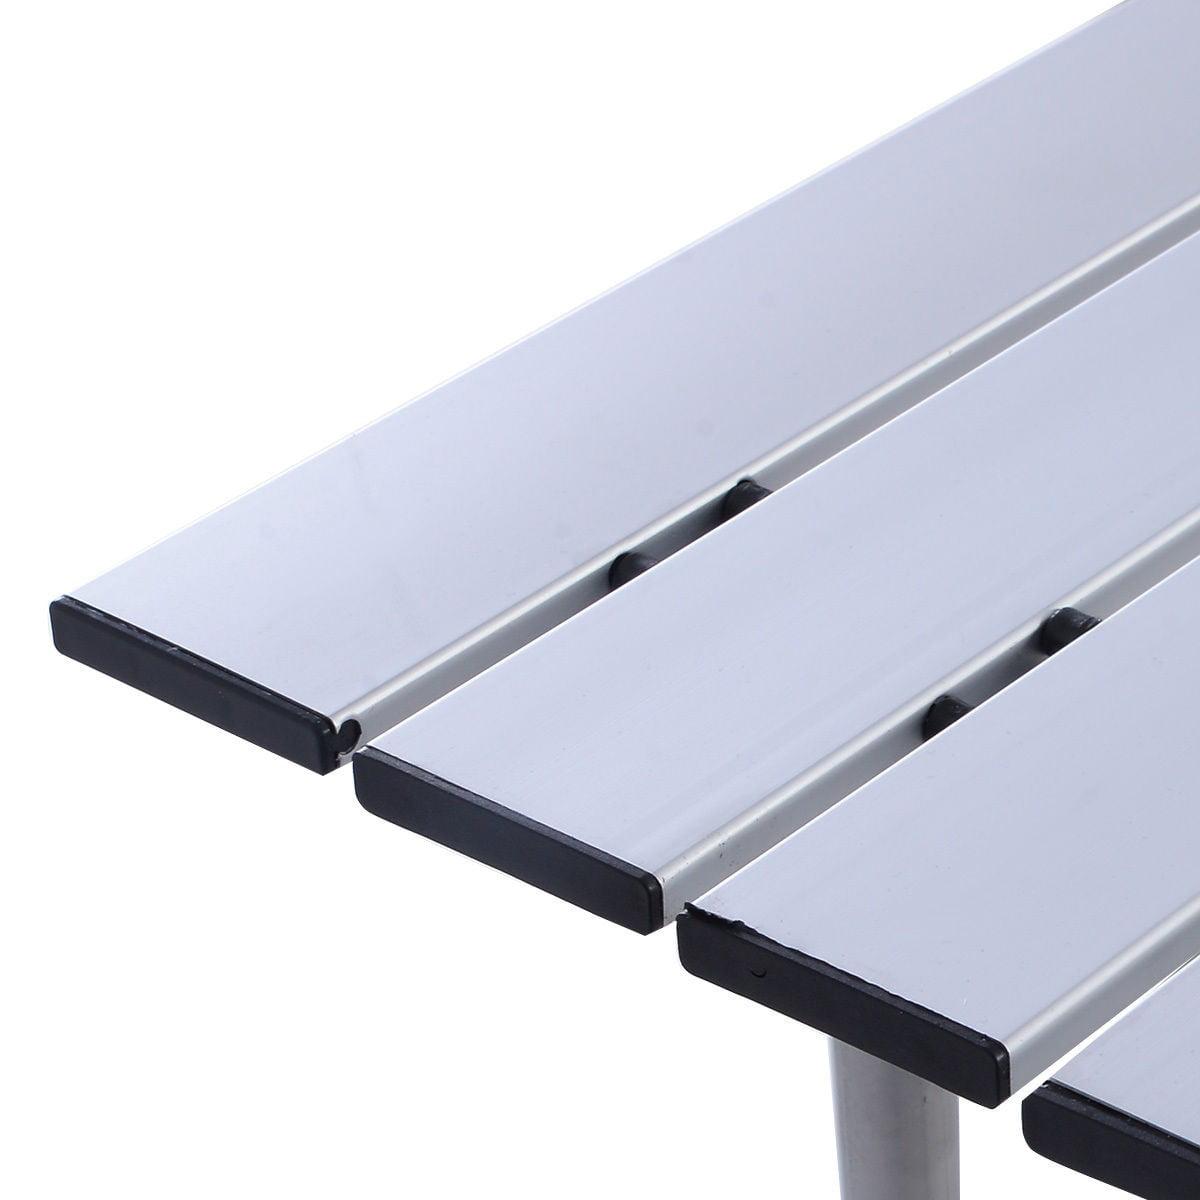 Portable Aluminum Roll Up Table Folding Camping Outdoor Picnic Table Garden  Yard (Small)   Walmart.com